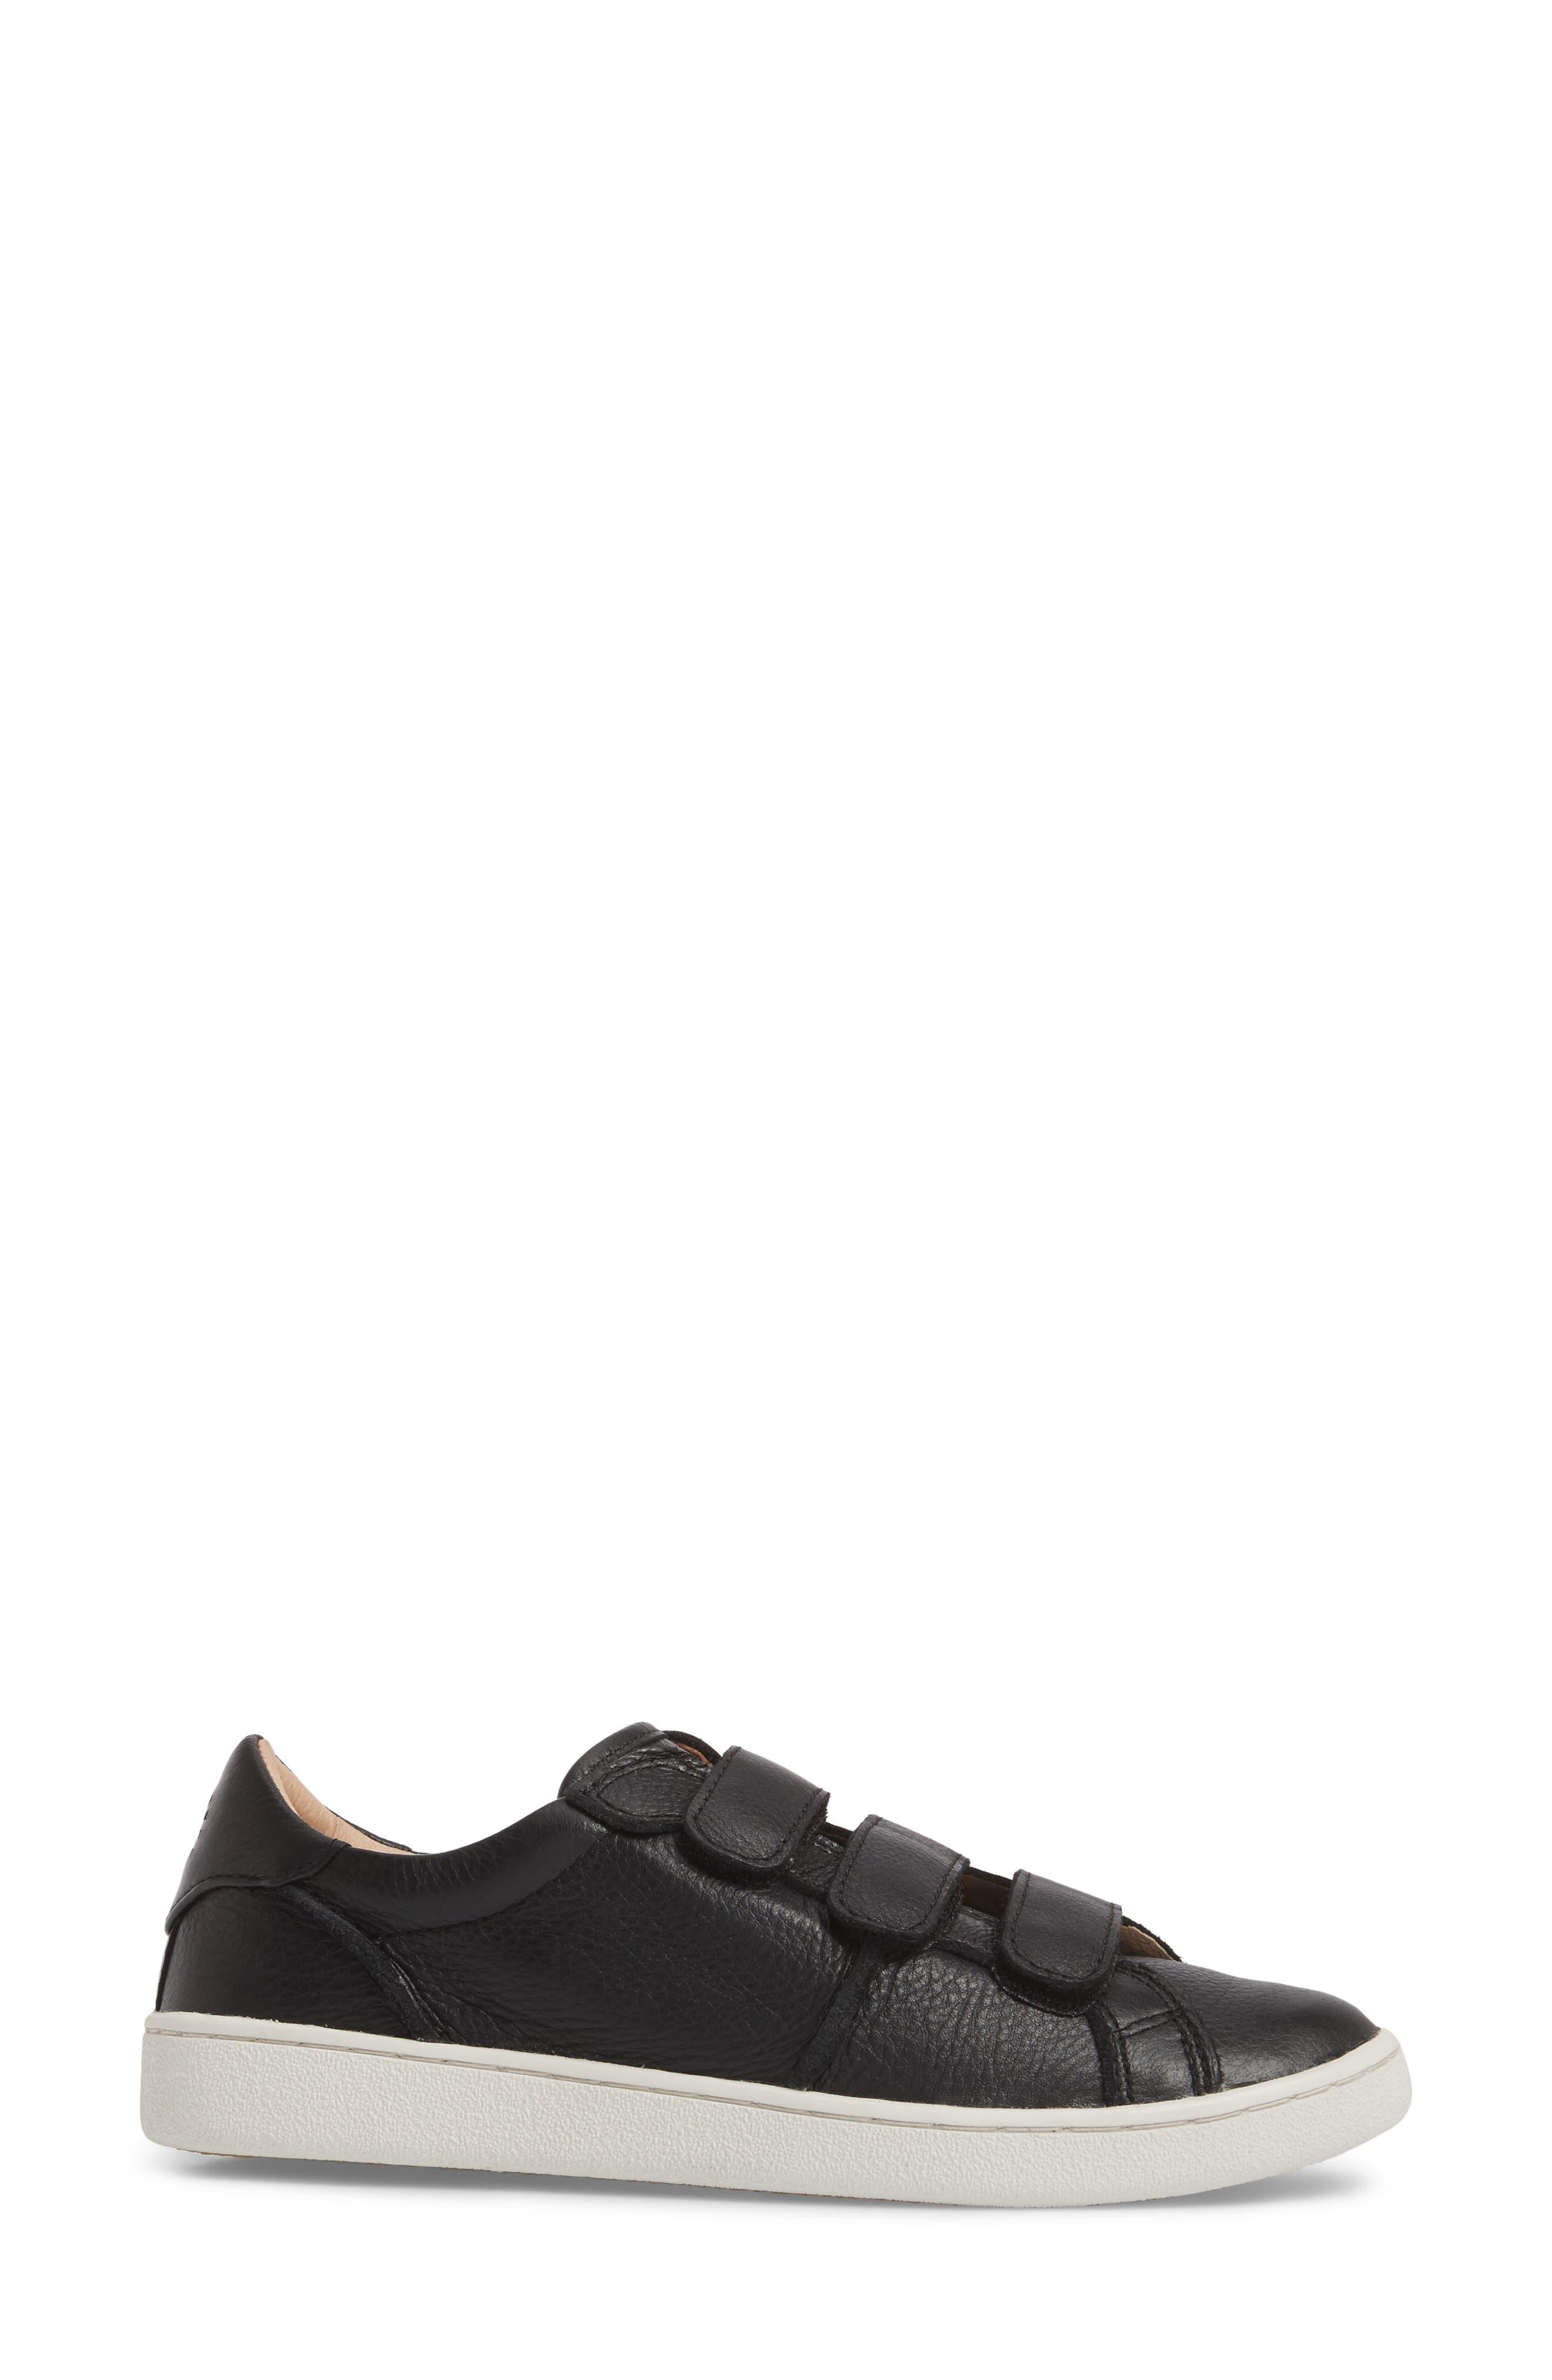 UGG<SUP>®</SUP>, Alix Sneaker, Alternate thumbnail 3, color, 001